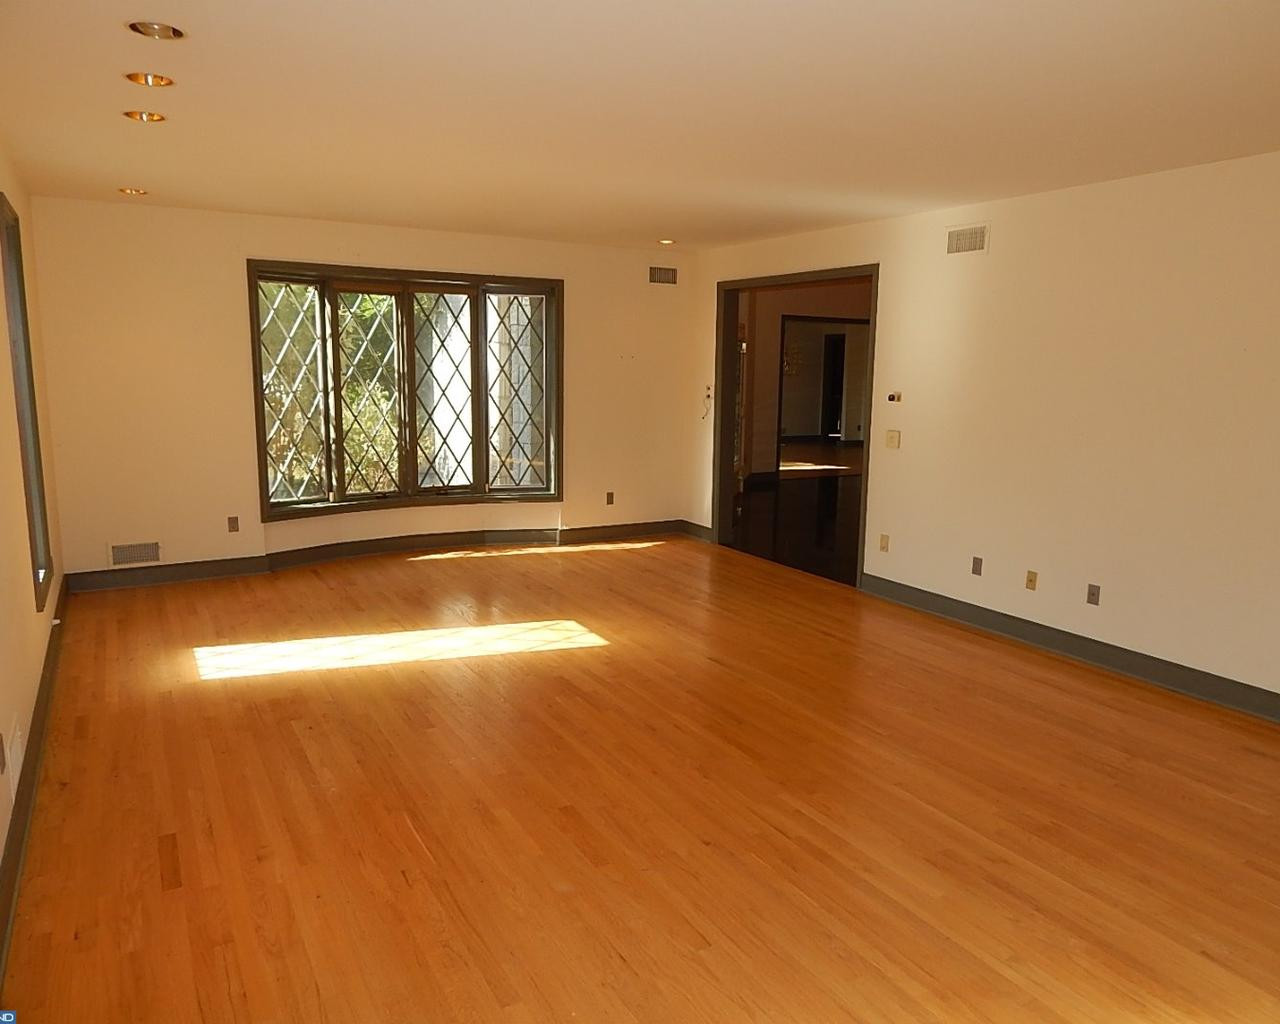 hardwood flooring princeton nj of 39 foxcroft dr princeton nj 08540 mls 7092602 vylla intended for 1 of 999000 39 foxcroft dr princeton nj 08540